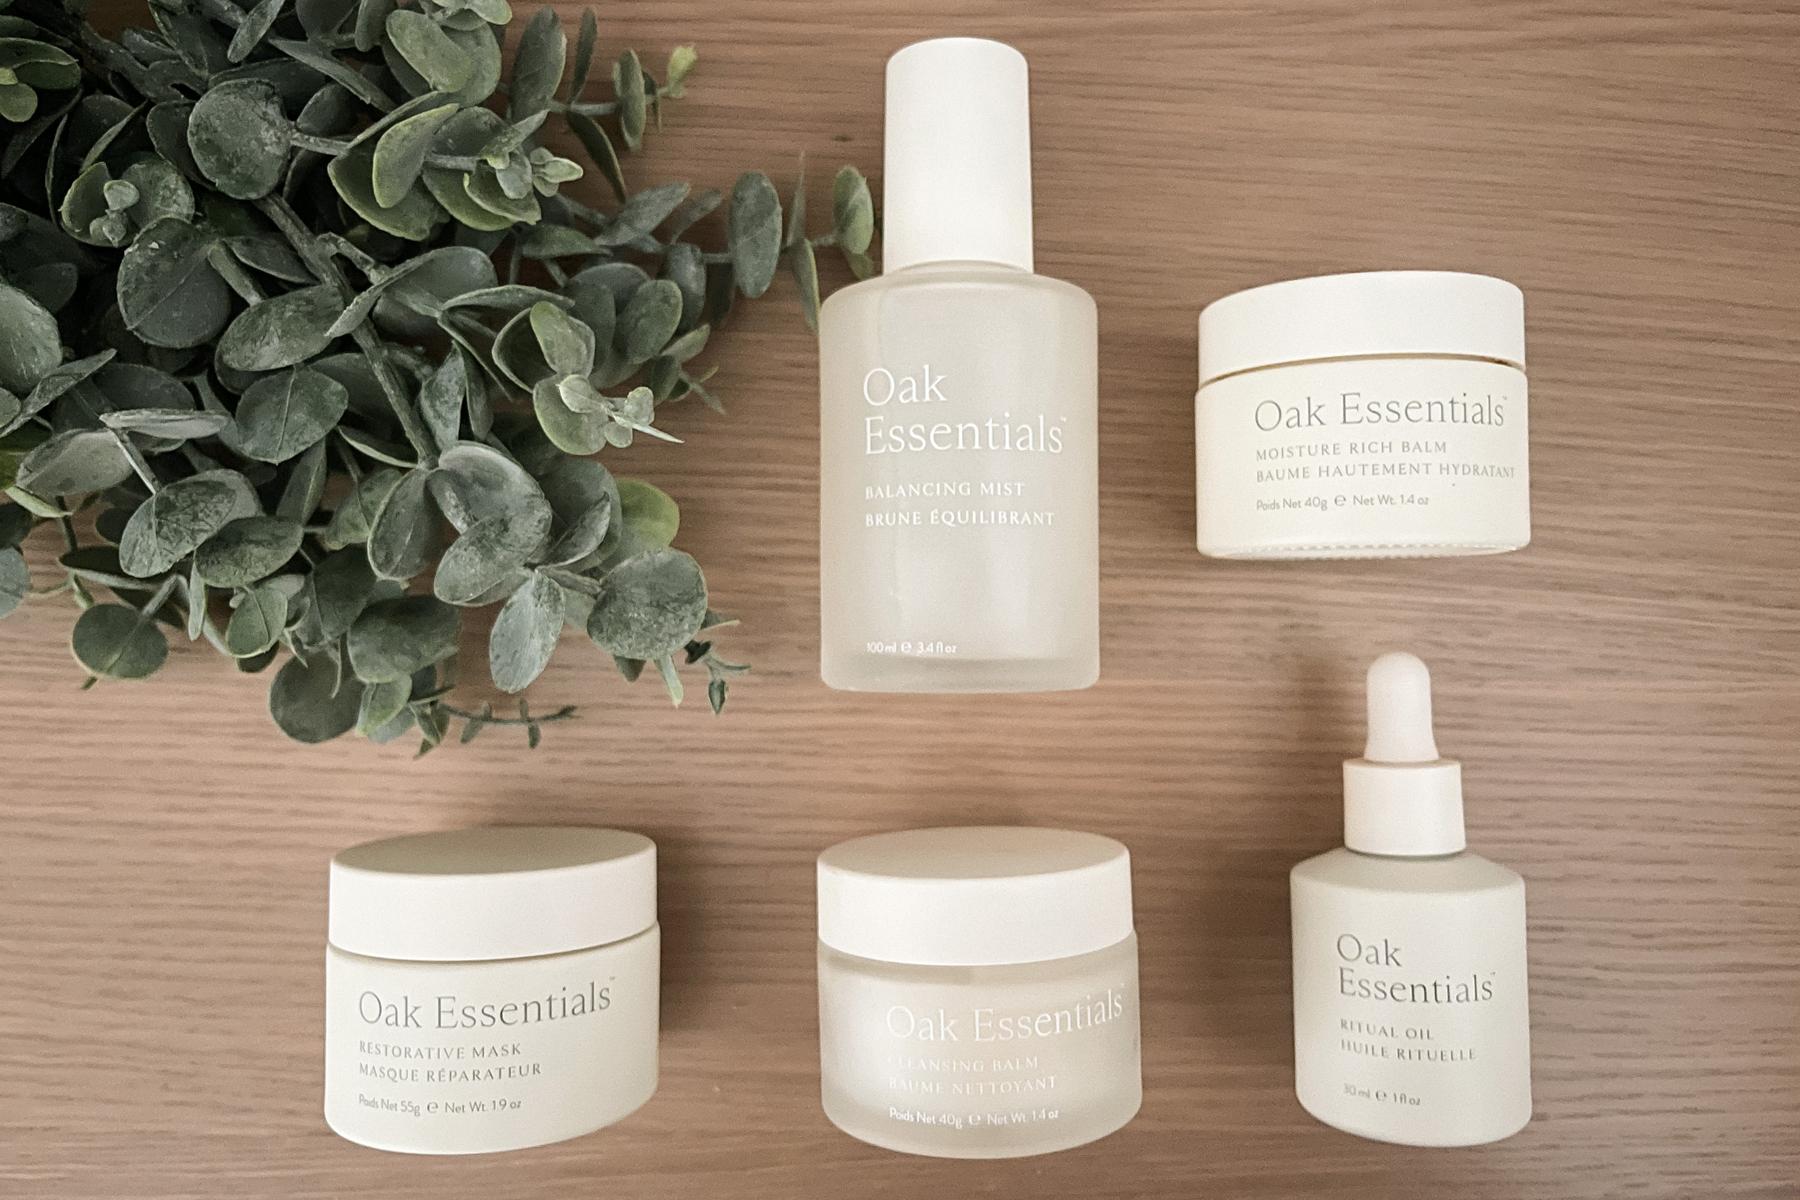 Jenni Kayne Oak Essentials Skincare